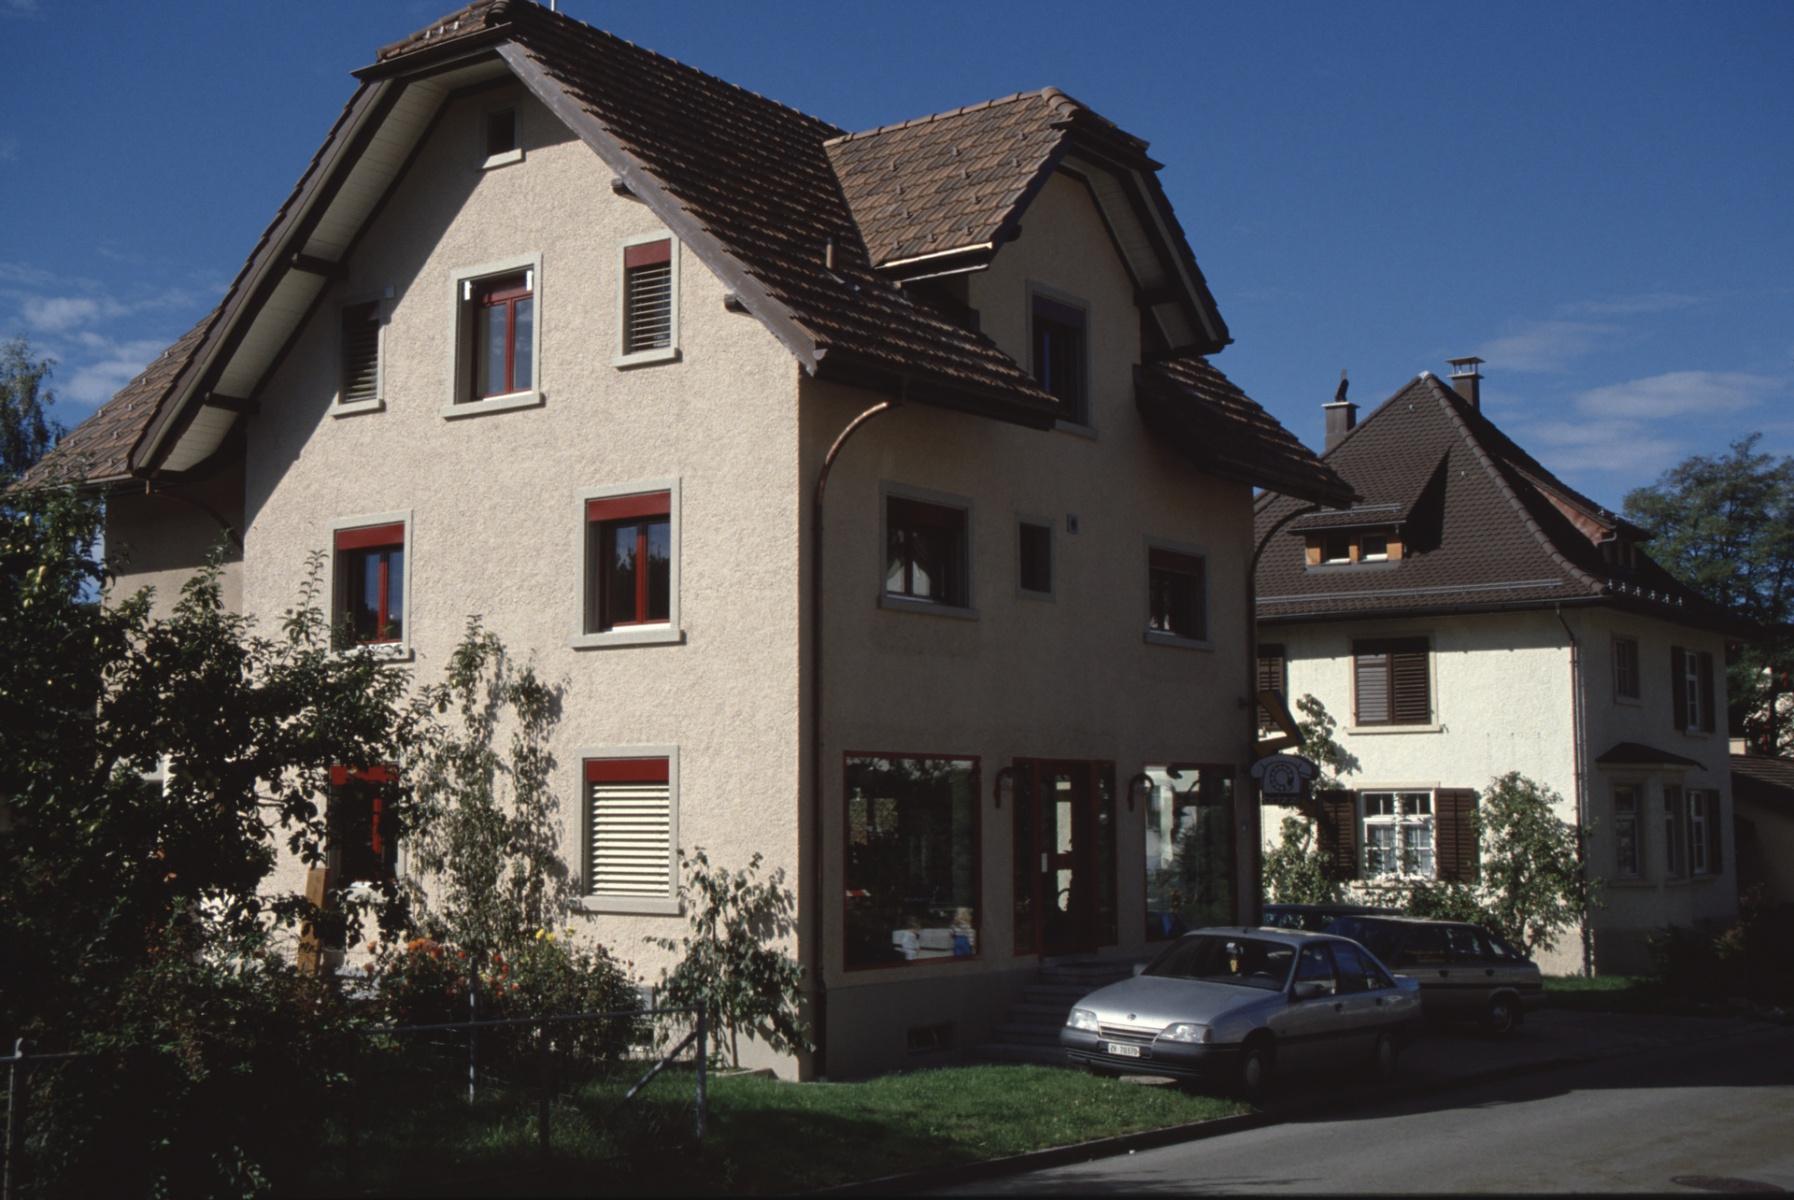 Bahnhofstr.13, Renoviertes Haus Elektro Brizzi